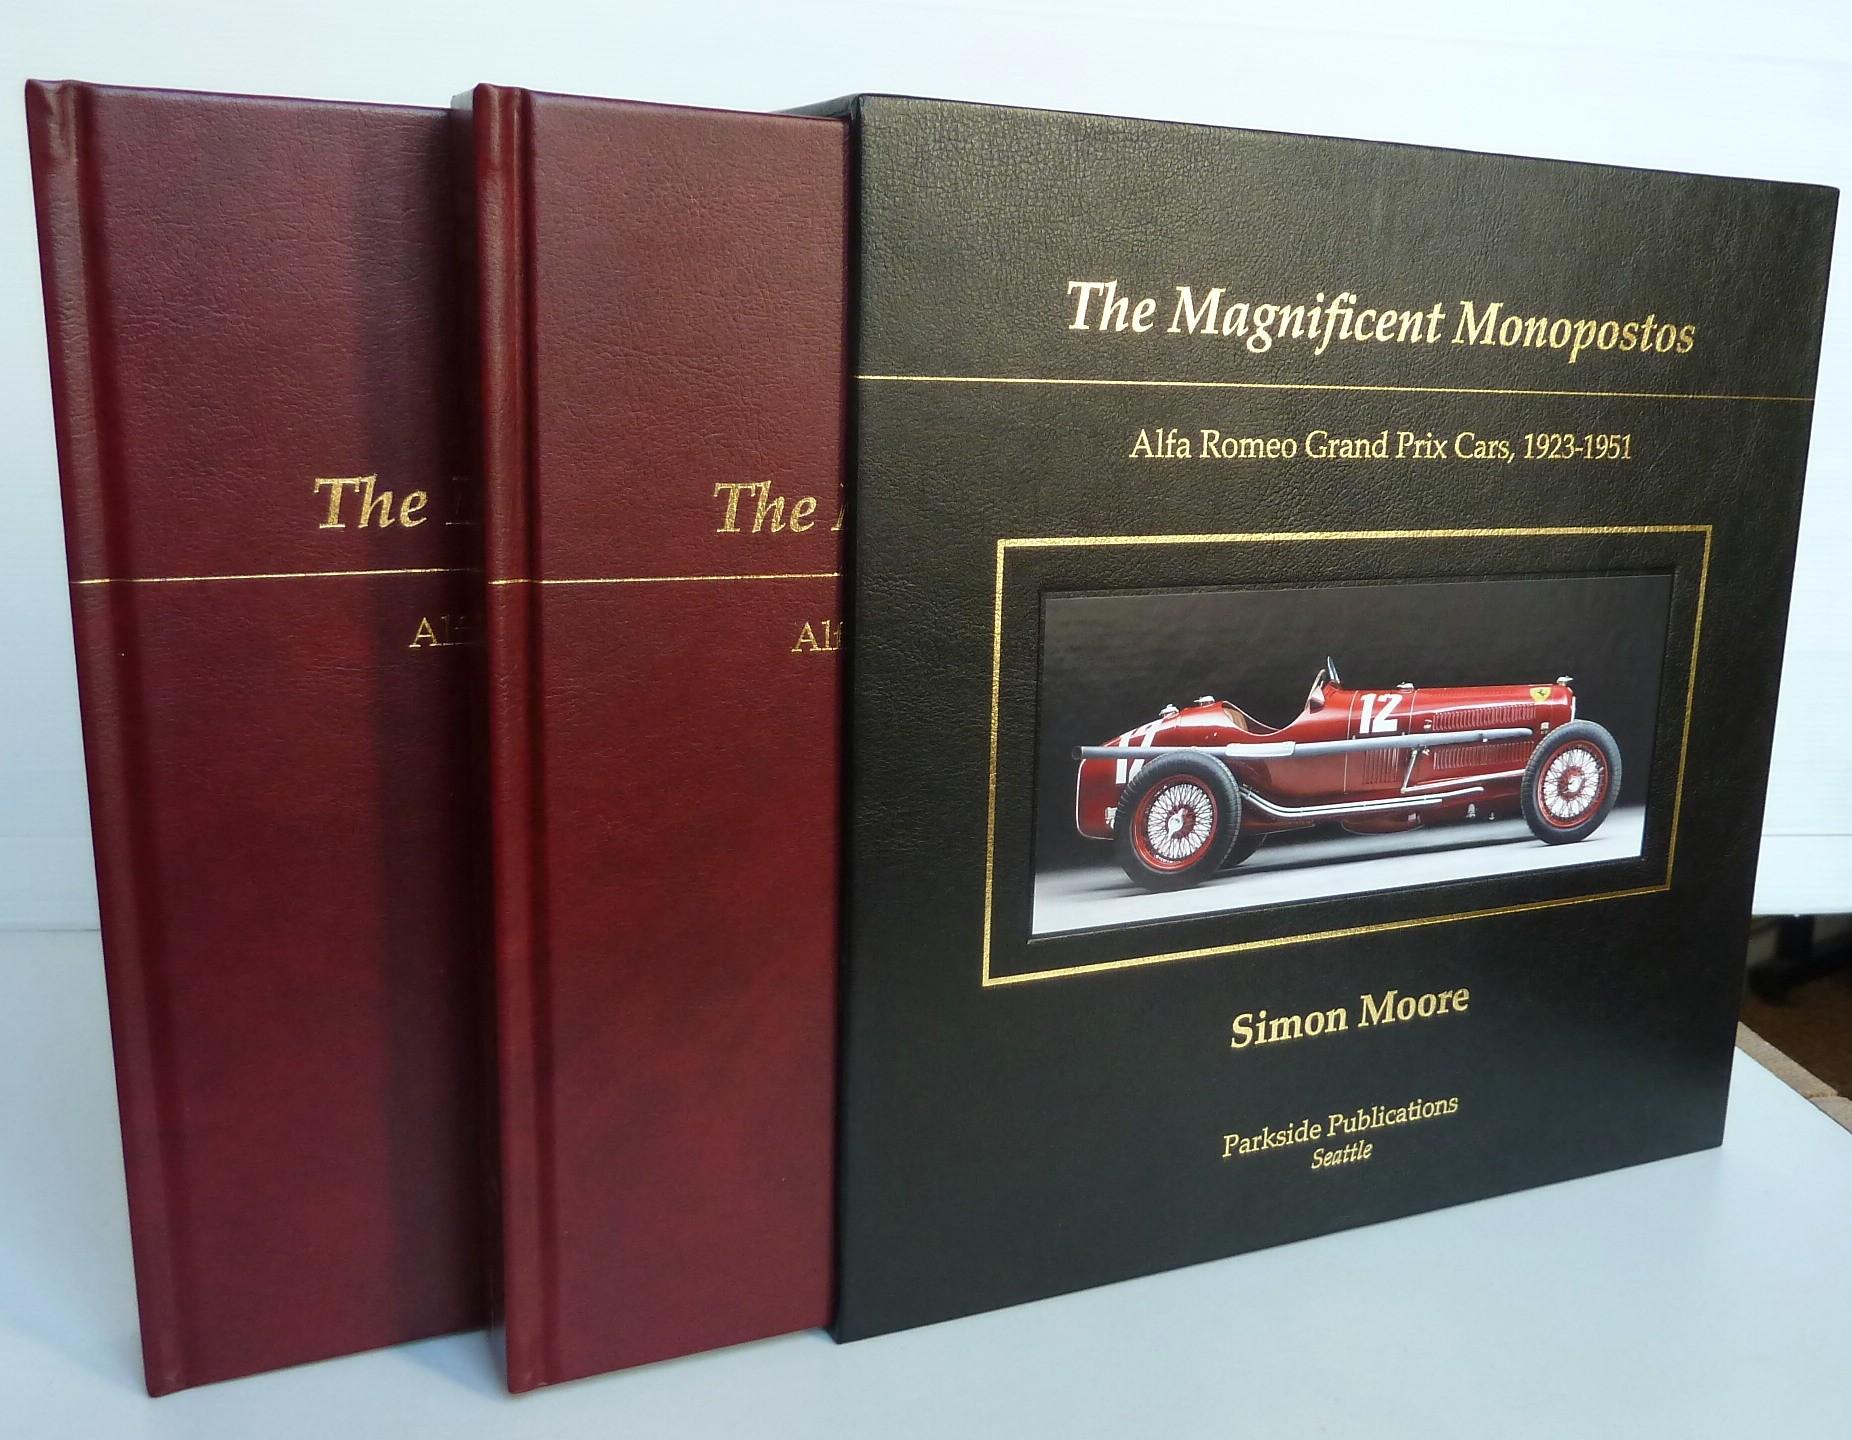 Ambiance Et Deco Idron the magnificent monopostos, alfa romeo grand prix cars, 1923